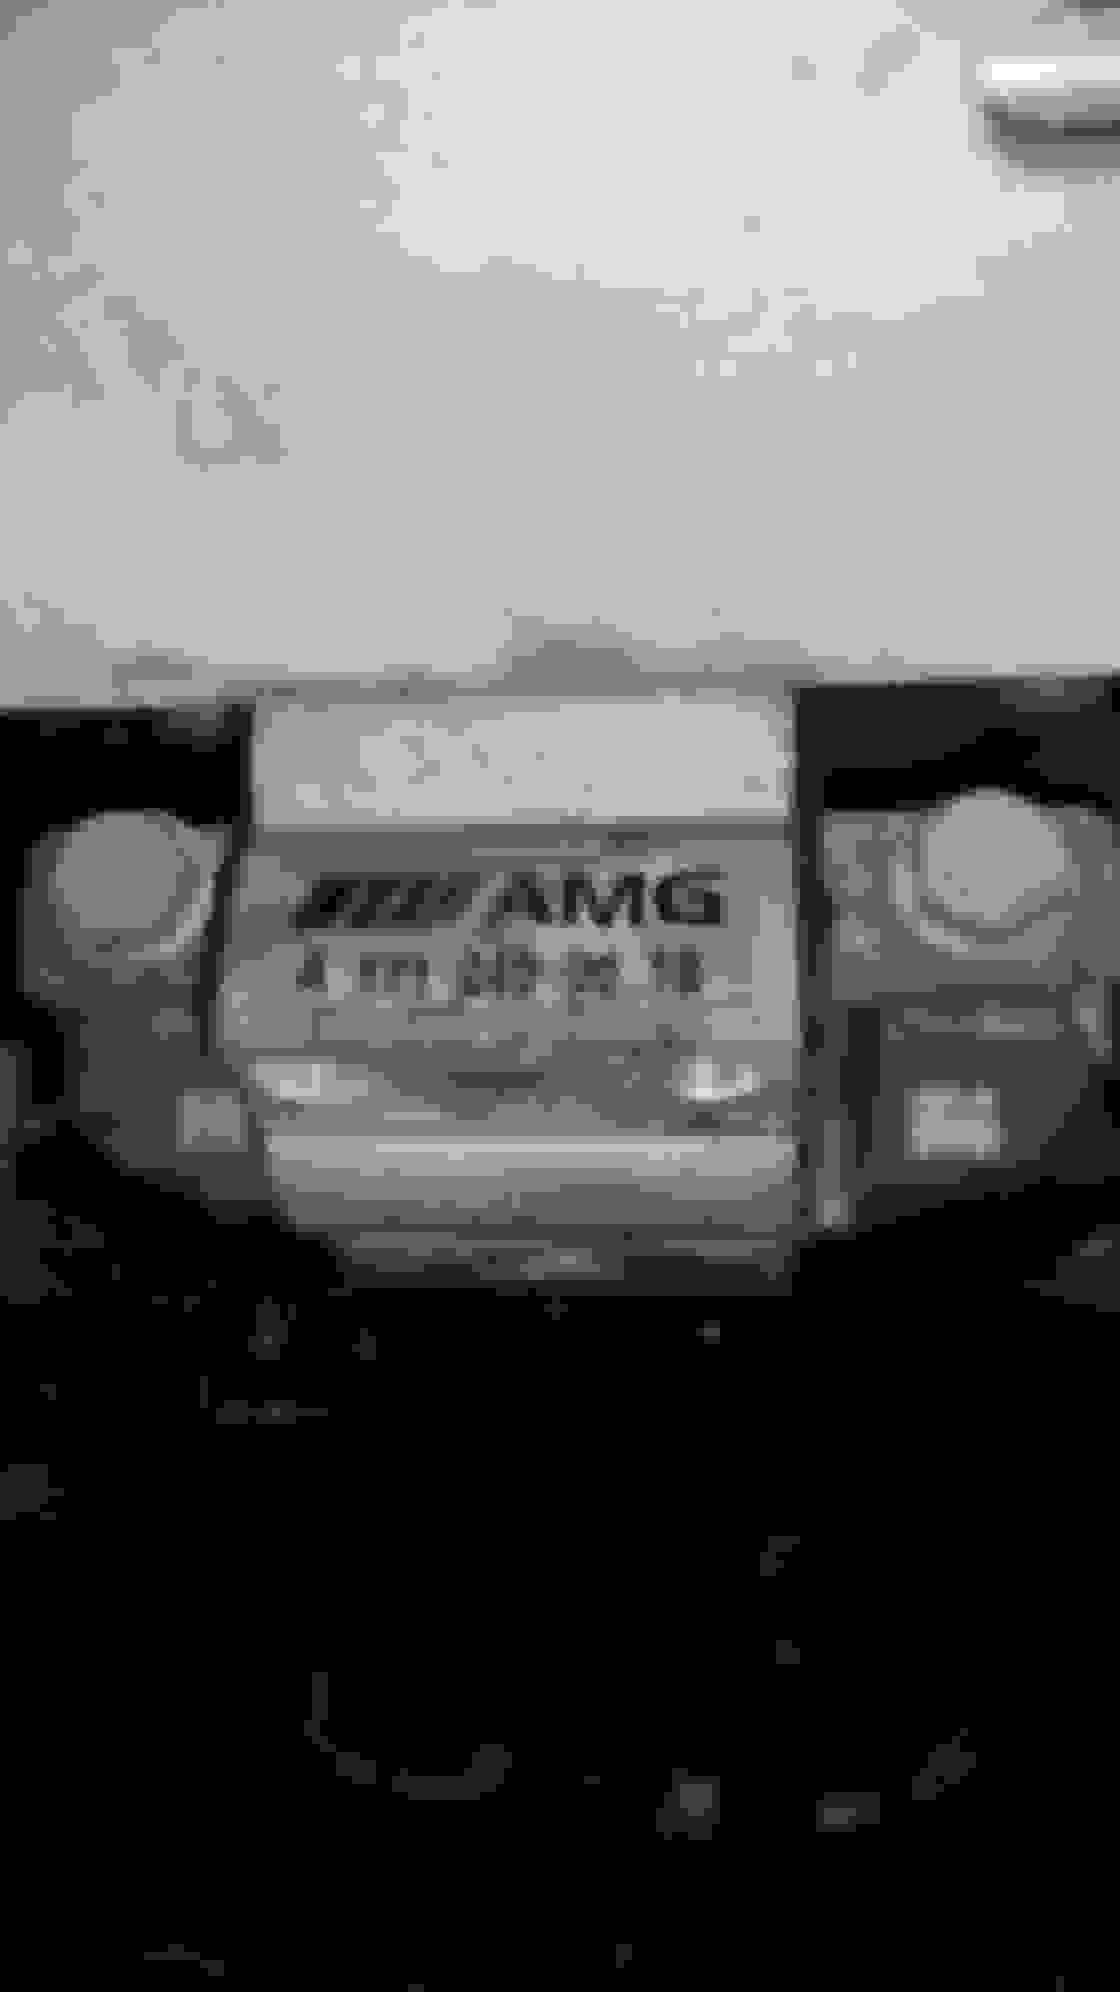 3 06 final drive swap - game changer! - MBWorld org Forums